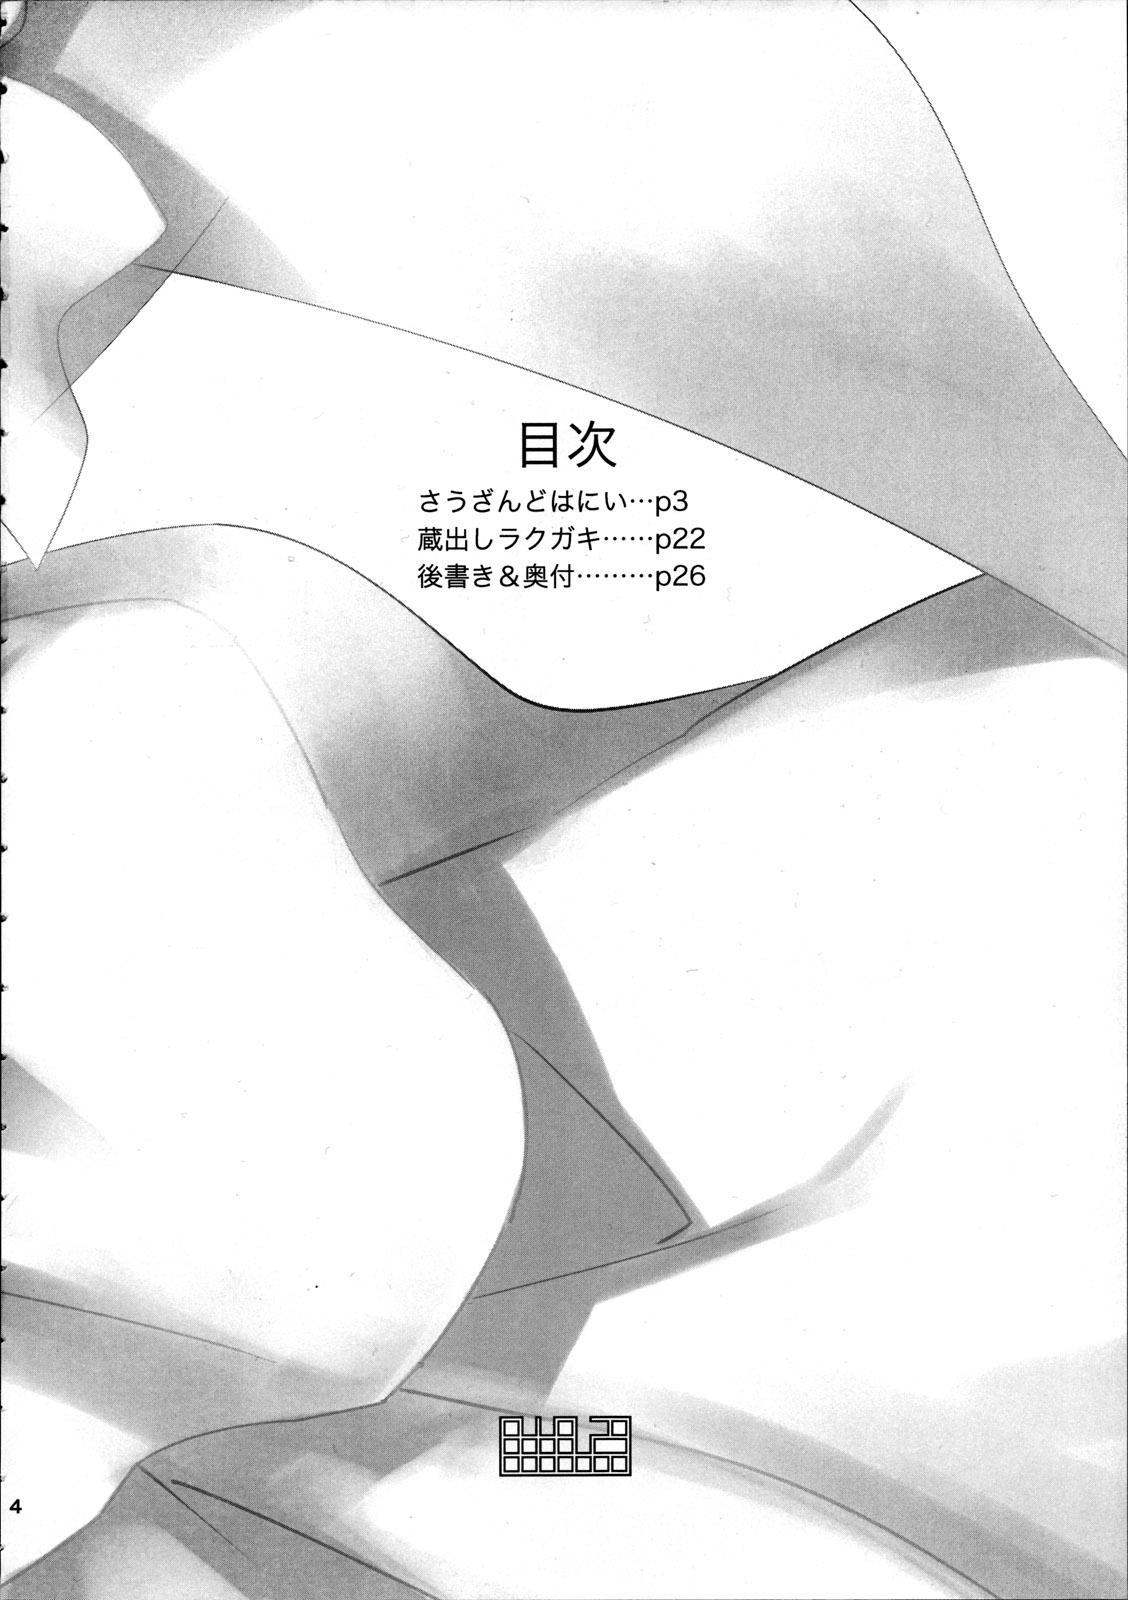 Shinsekai 2